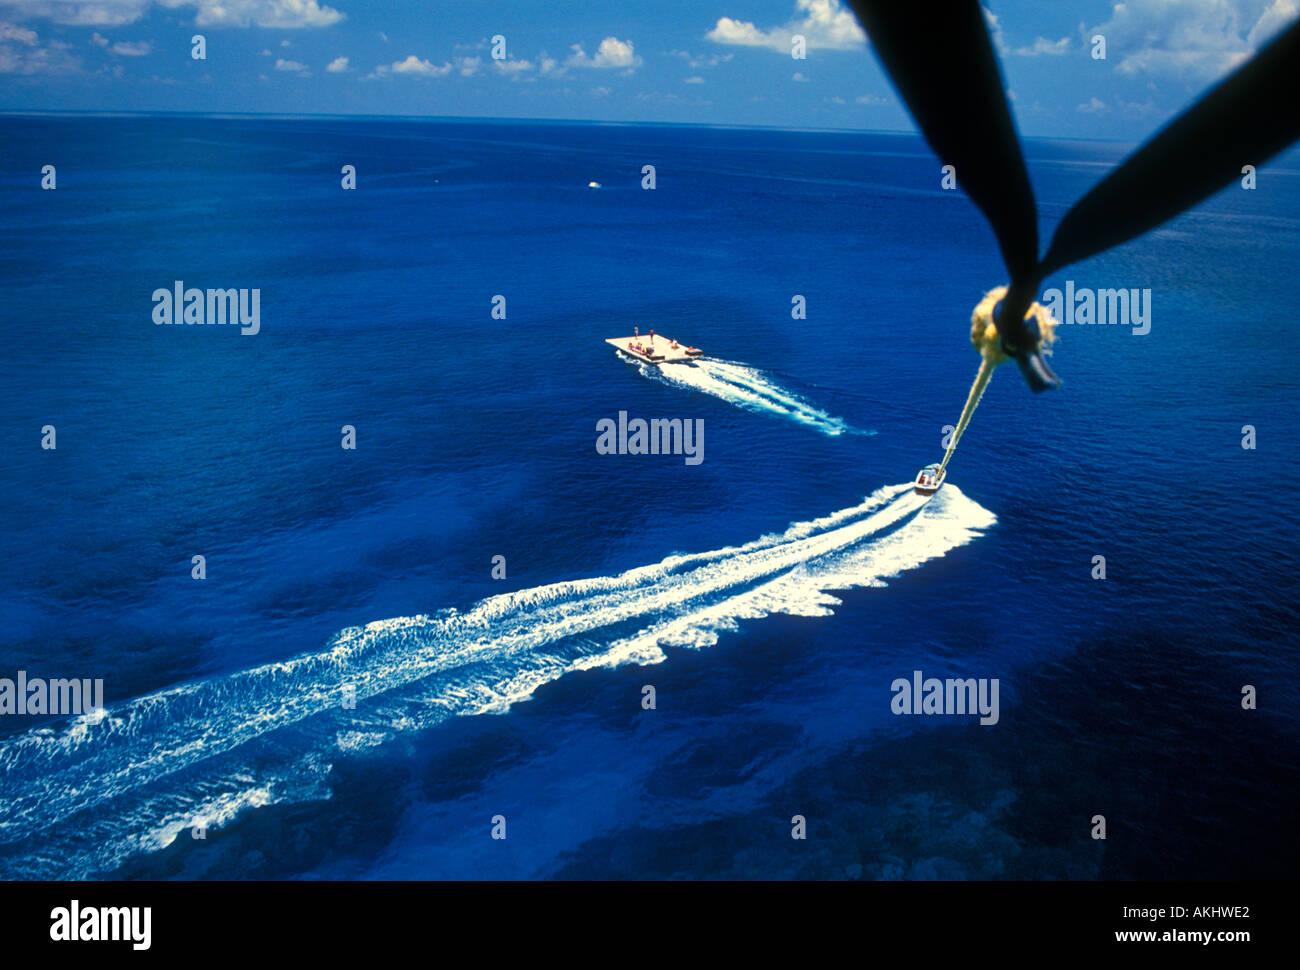 parasailing, Seven Mile Beach, Grand Cayman Island, Cayman Islands, Caribbean - Stock Image